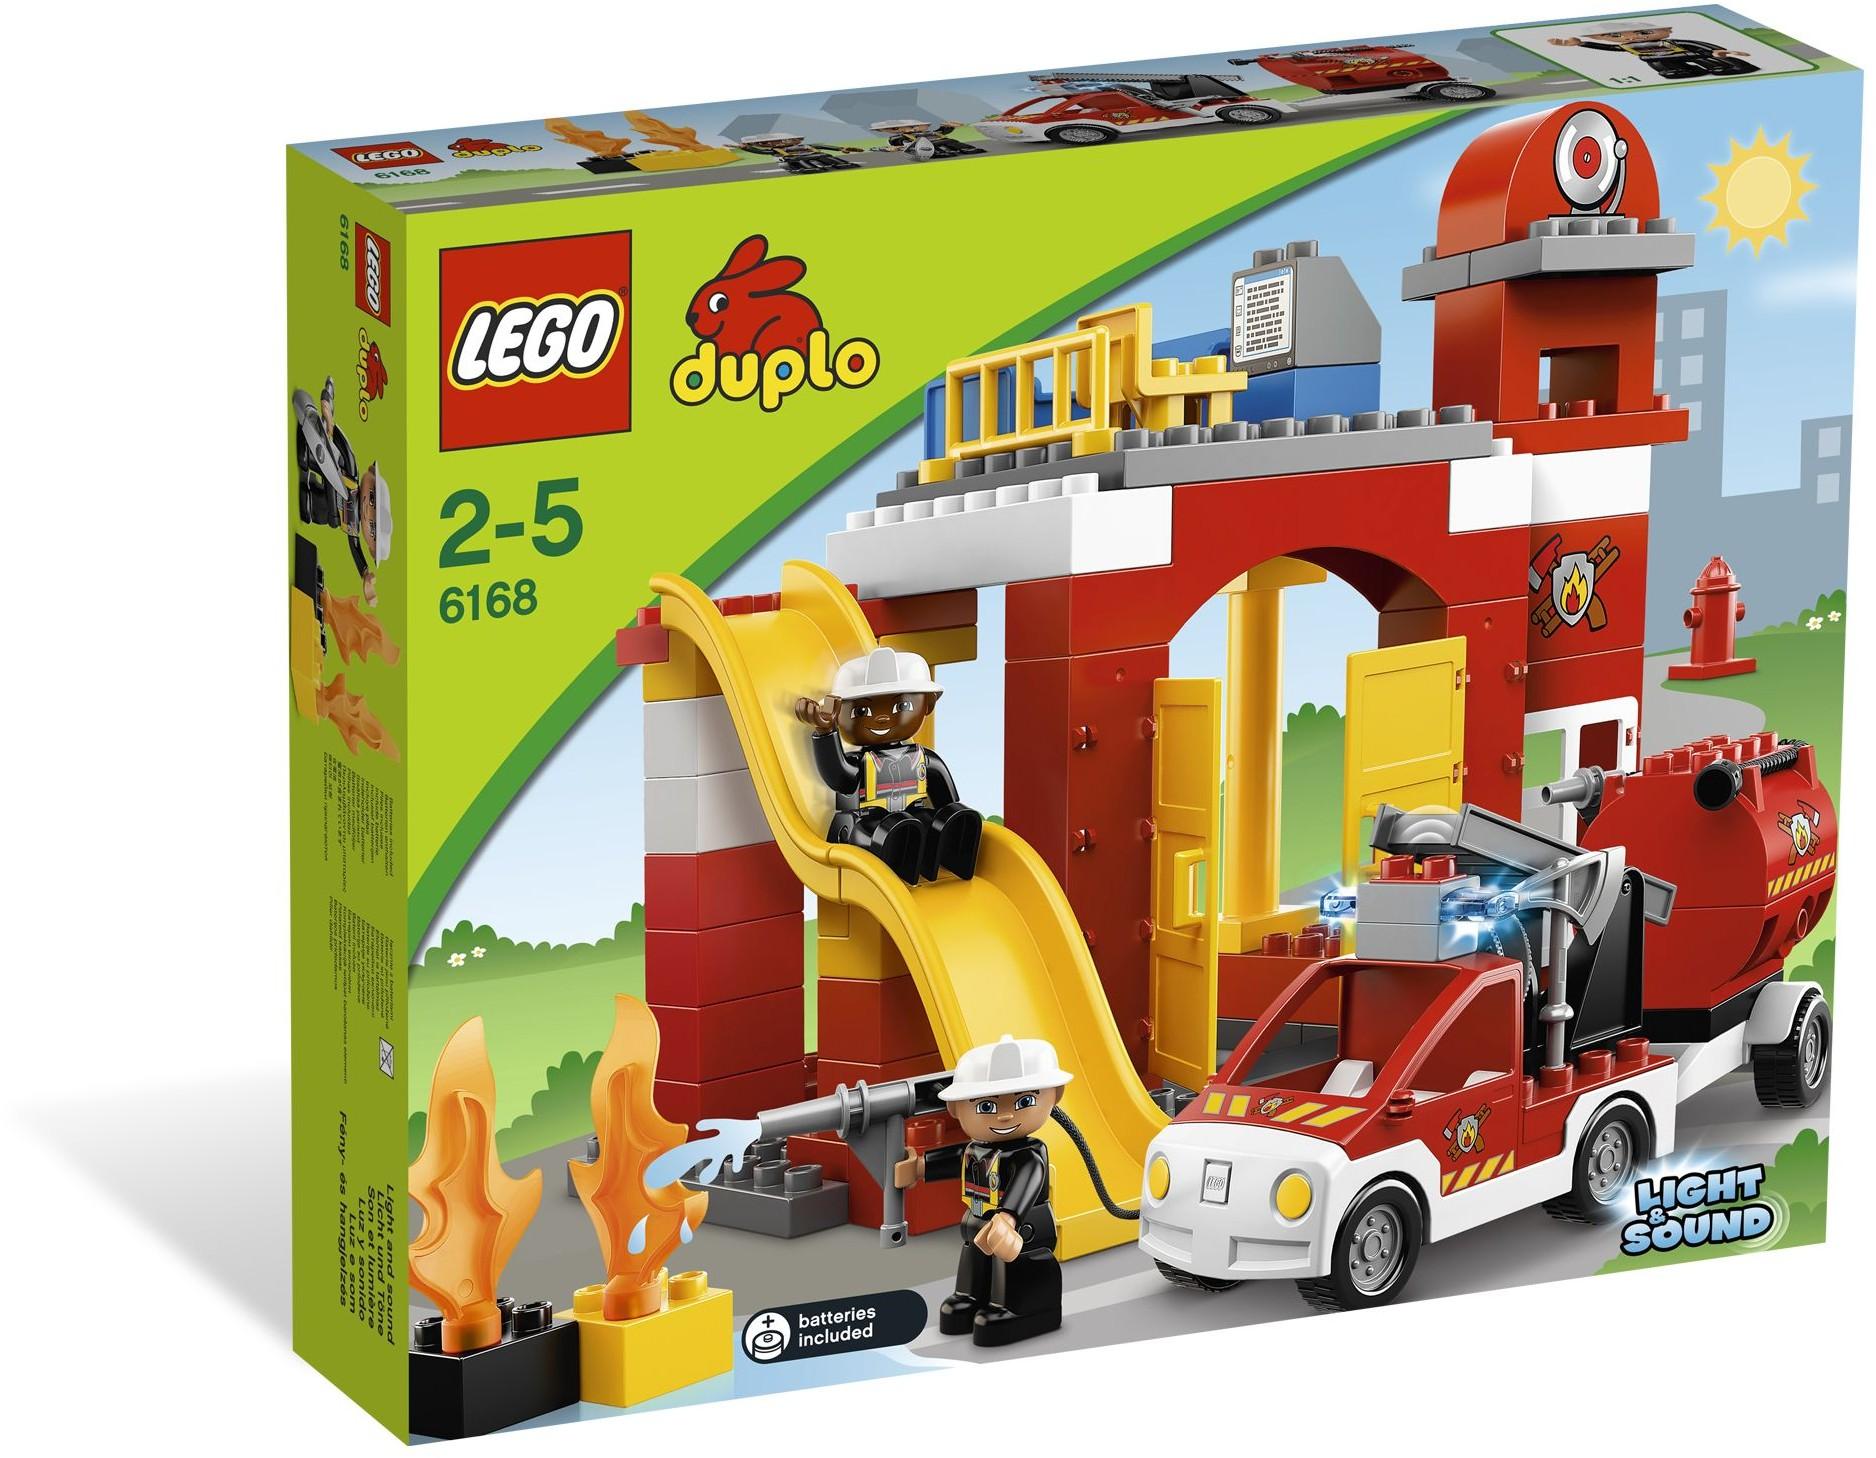 Lego 6168 Fire Station